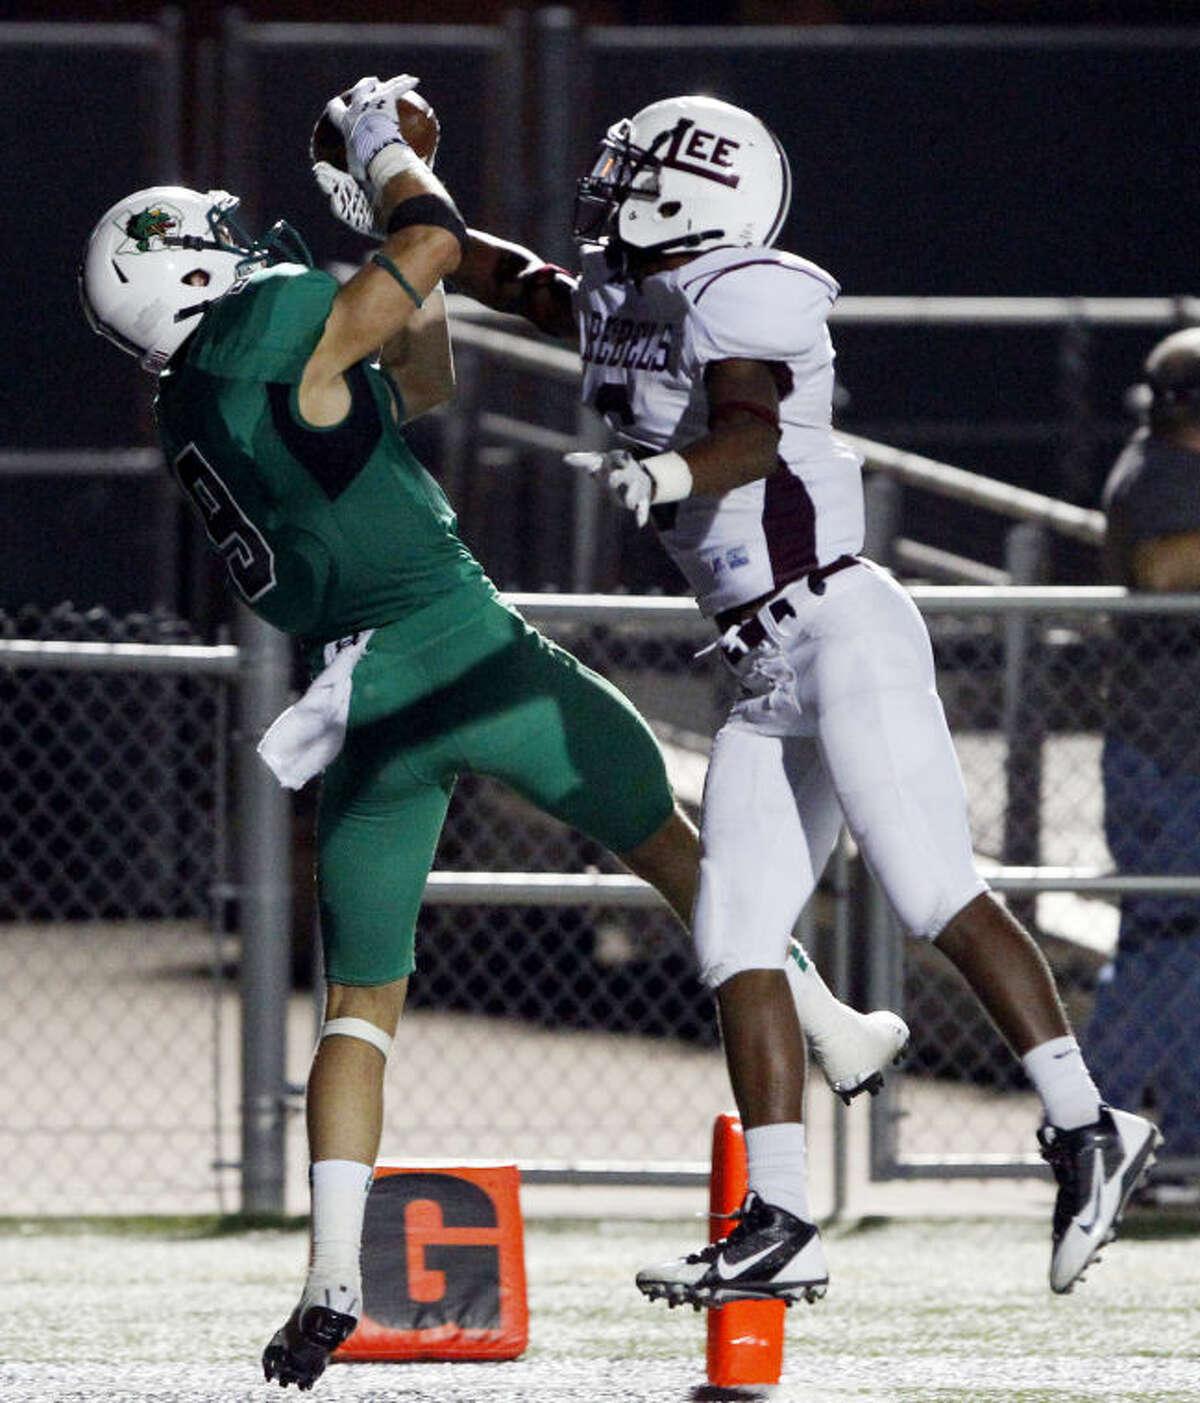 Southlake Carroll's Luke Timian catches a touchdown pass despite the efforts of Lee's Juwan Lee on Sept. 6. (Star-Telegram/ Richard W. Rodriguez)